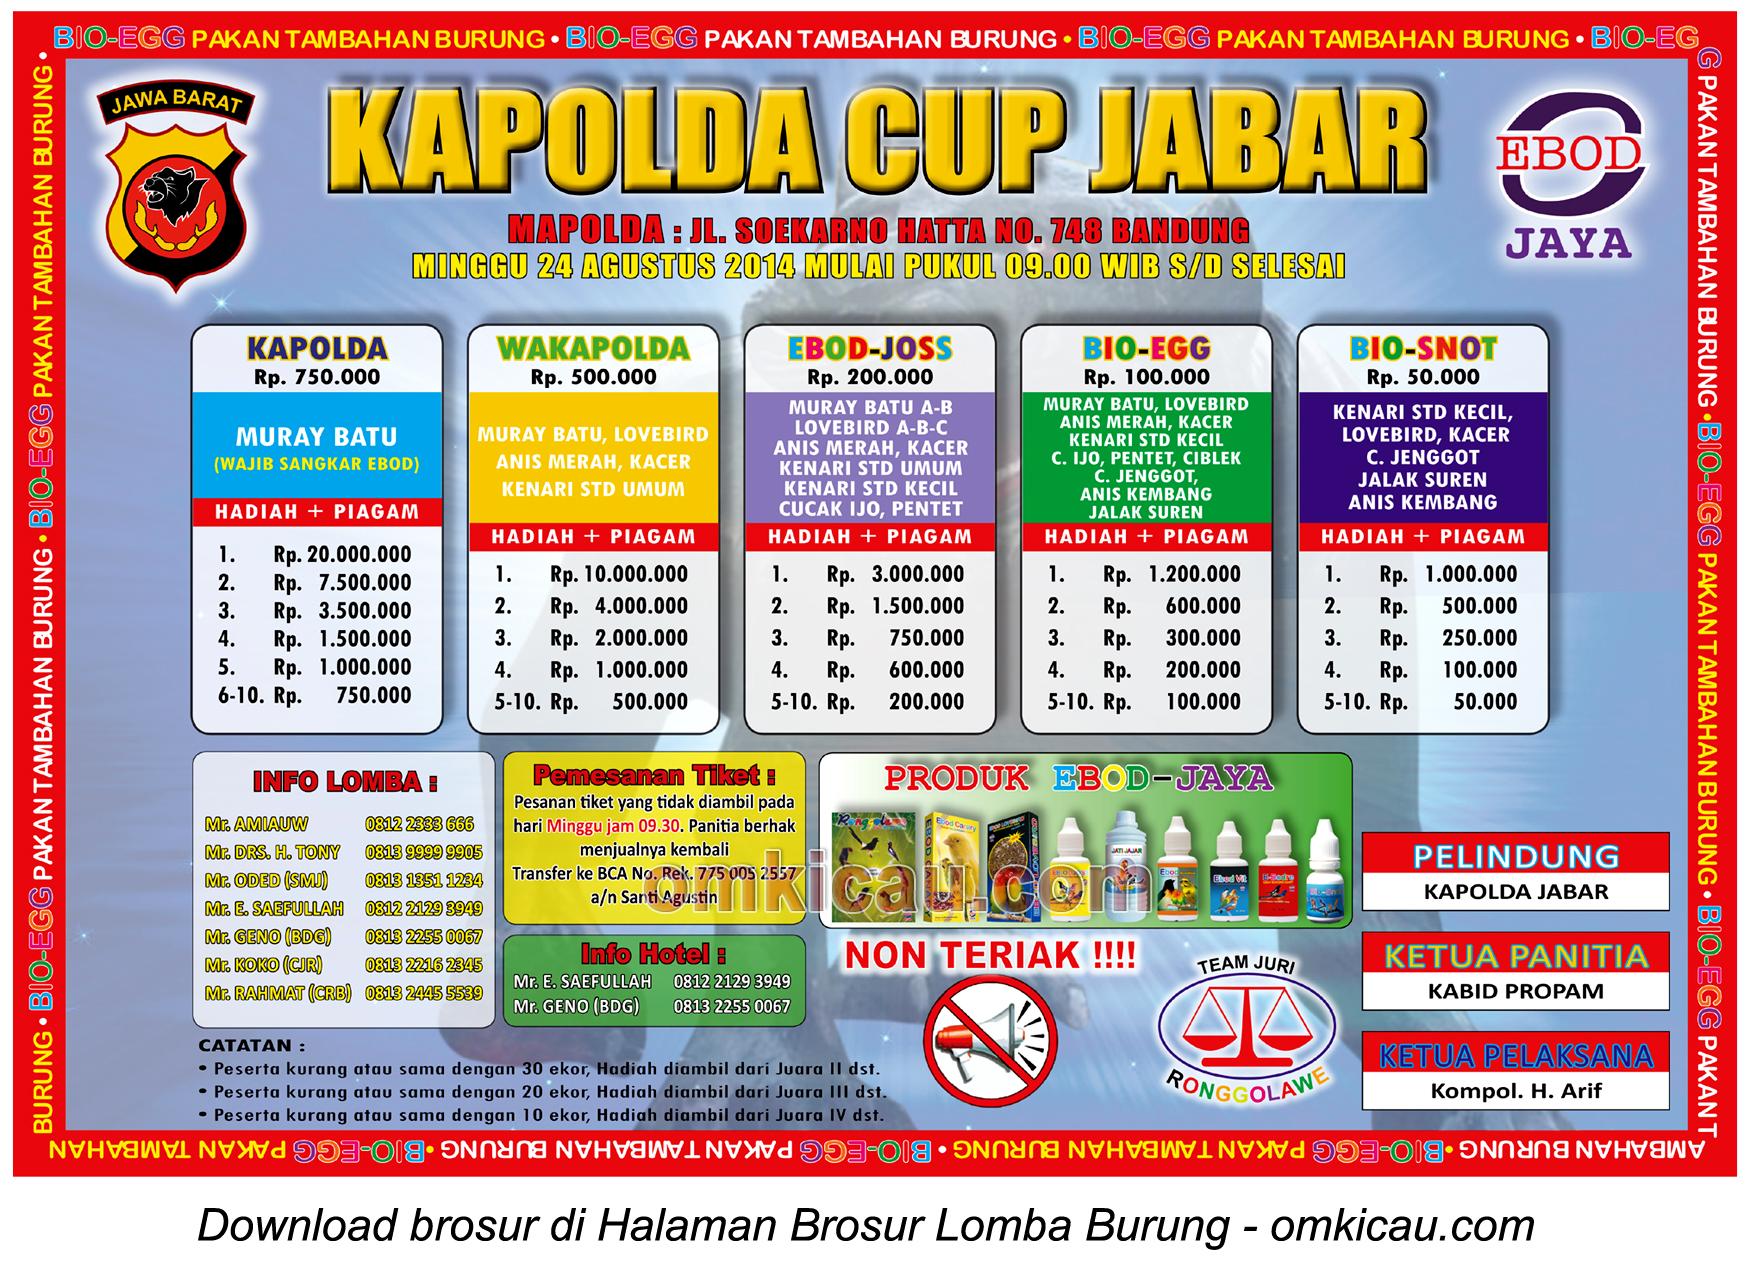 Lomba Burung Kapolda Cup Jabar, Bandung, 24 Agustus 2014